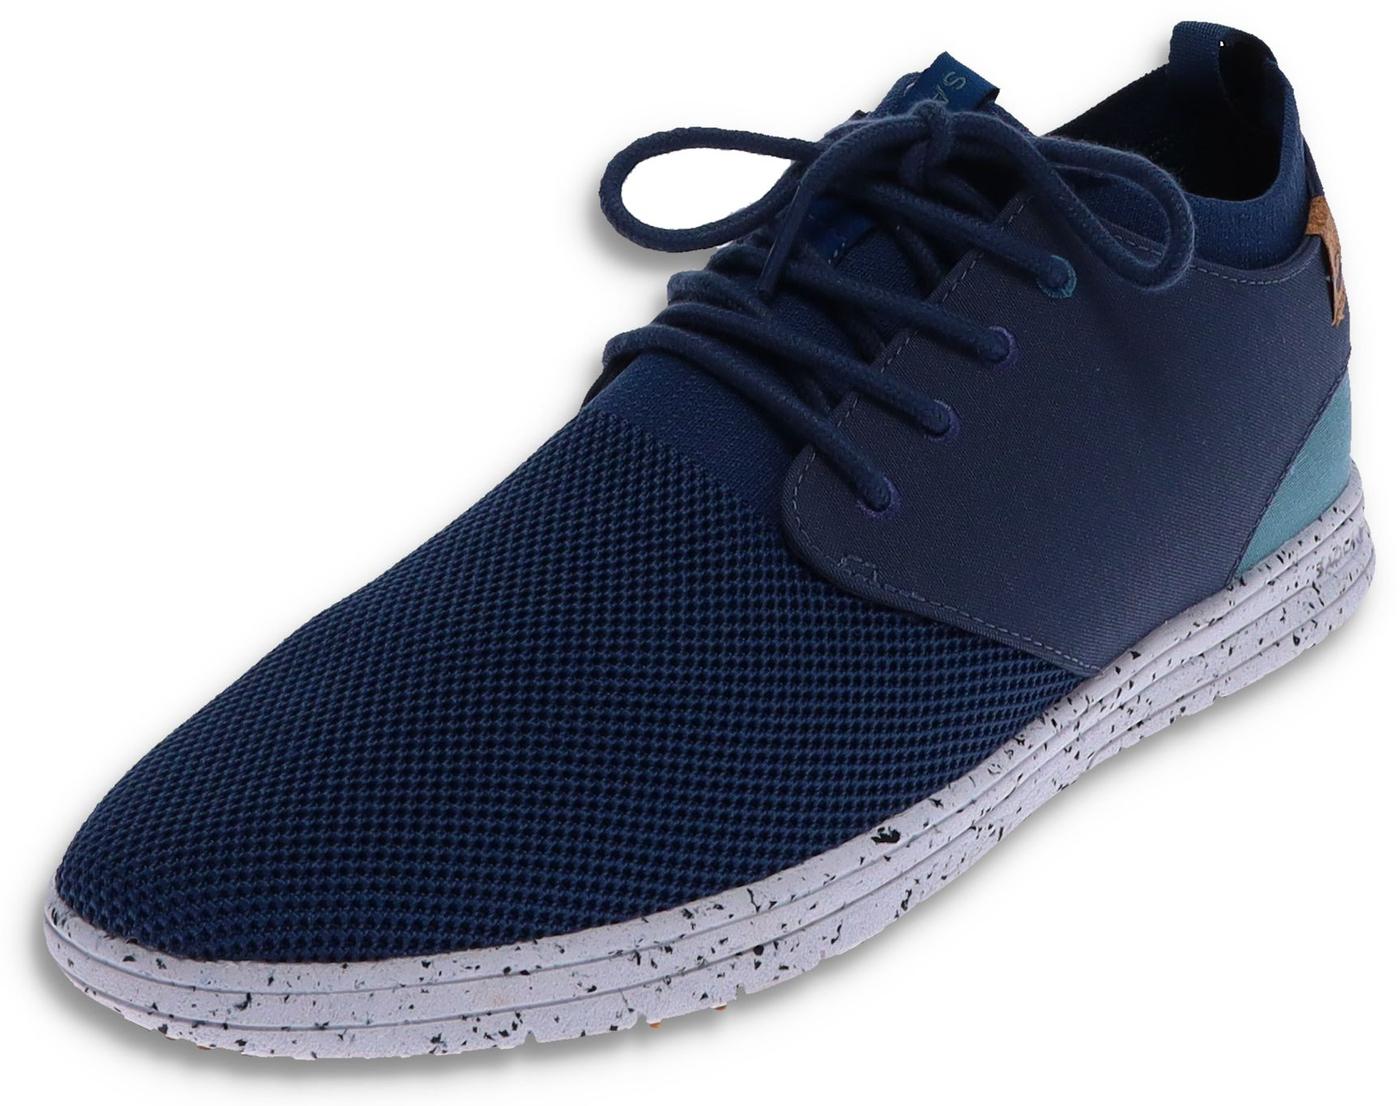 Saola SEMNOZ II Dark Denim vegan Men's Sneaker - blue